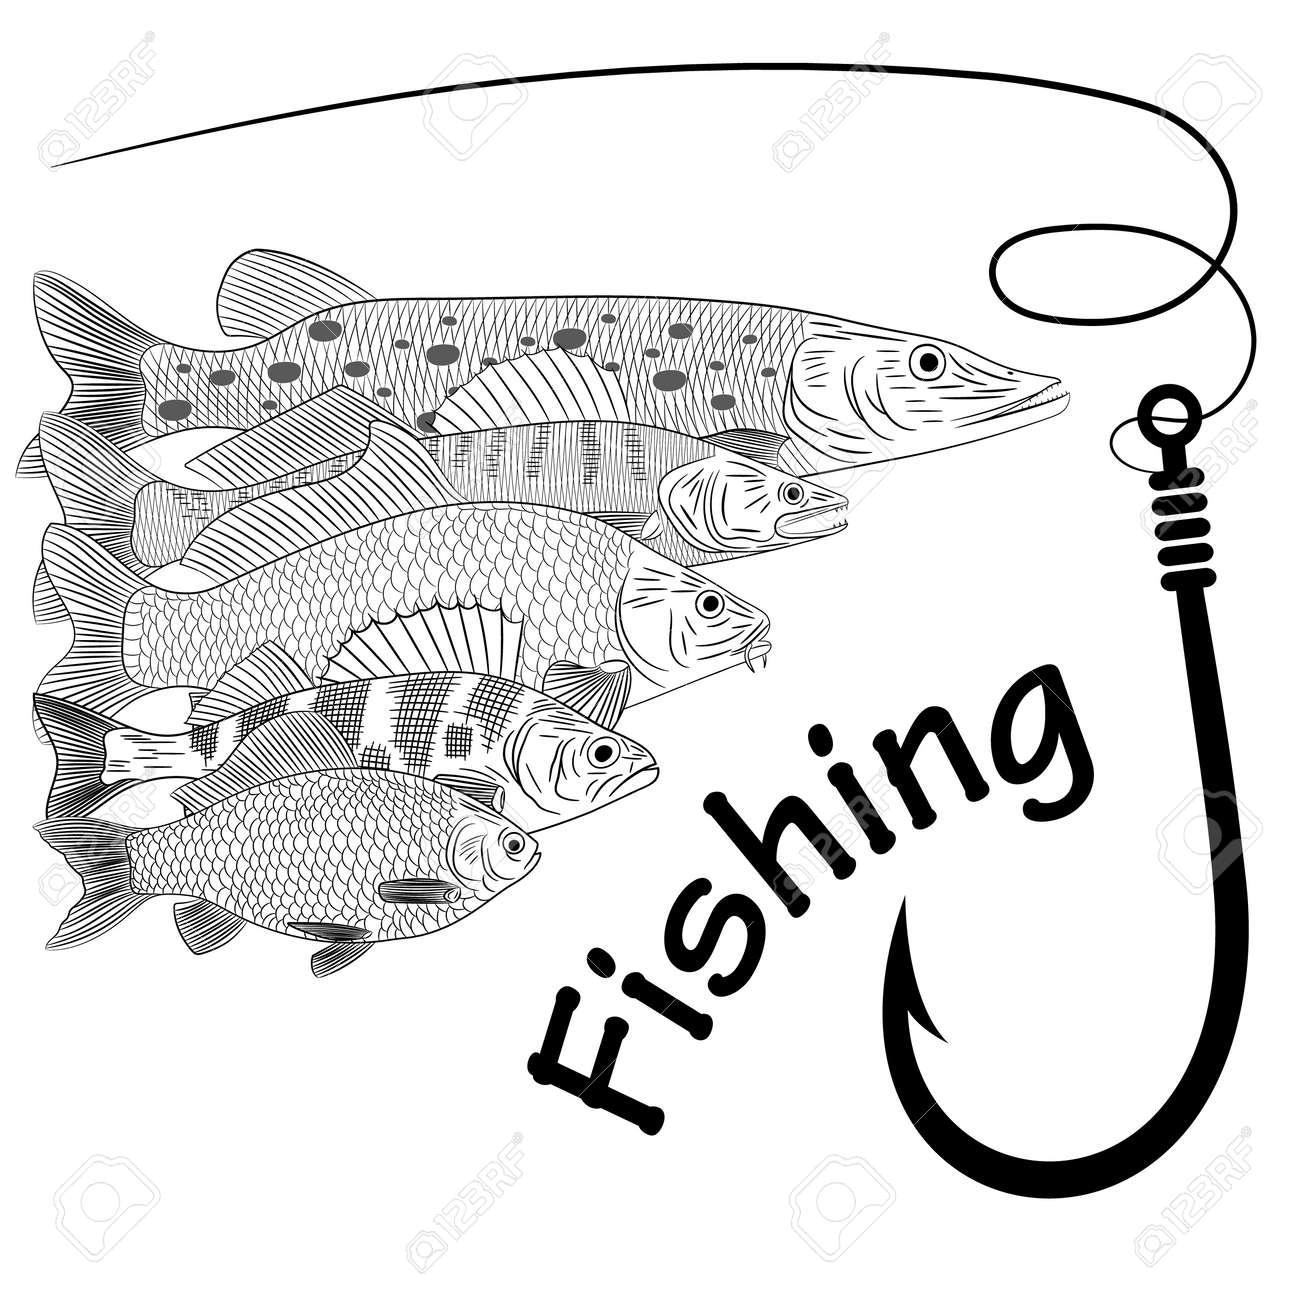 Drawing on the theme of river fish pike pikeperch carp crucian carp